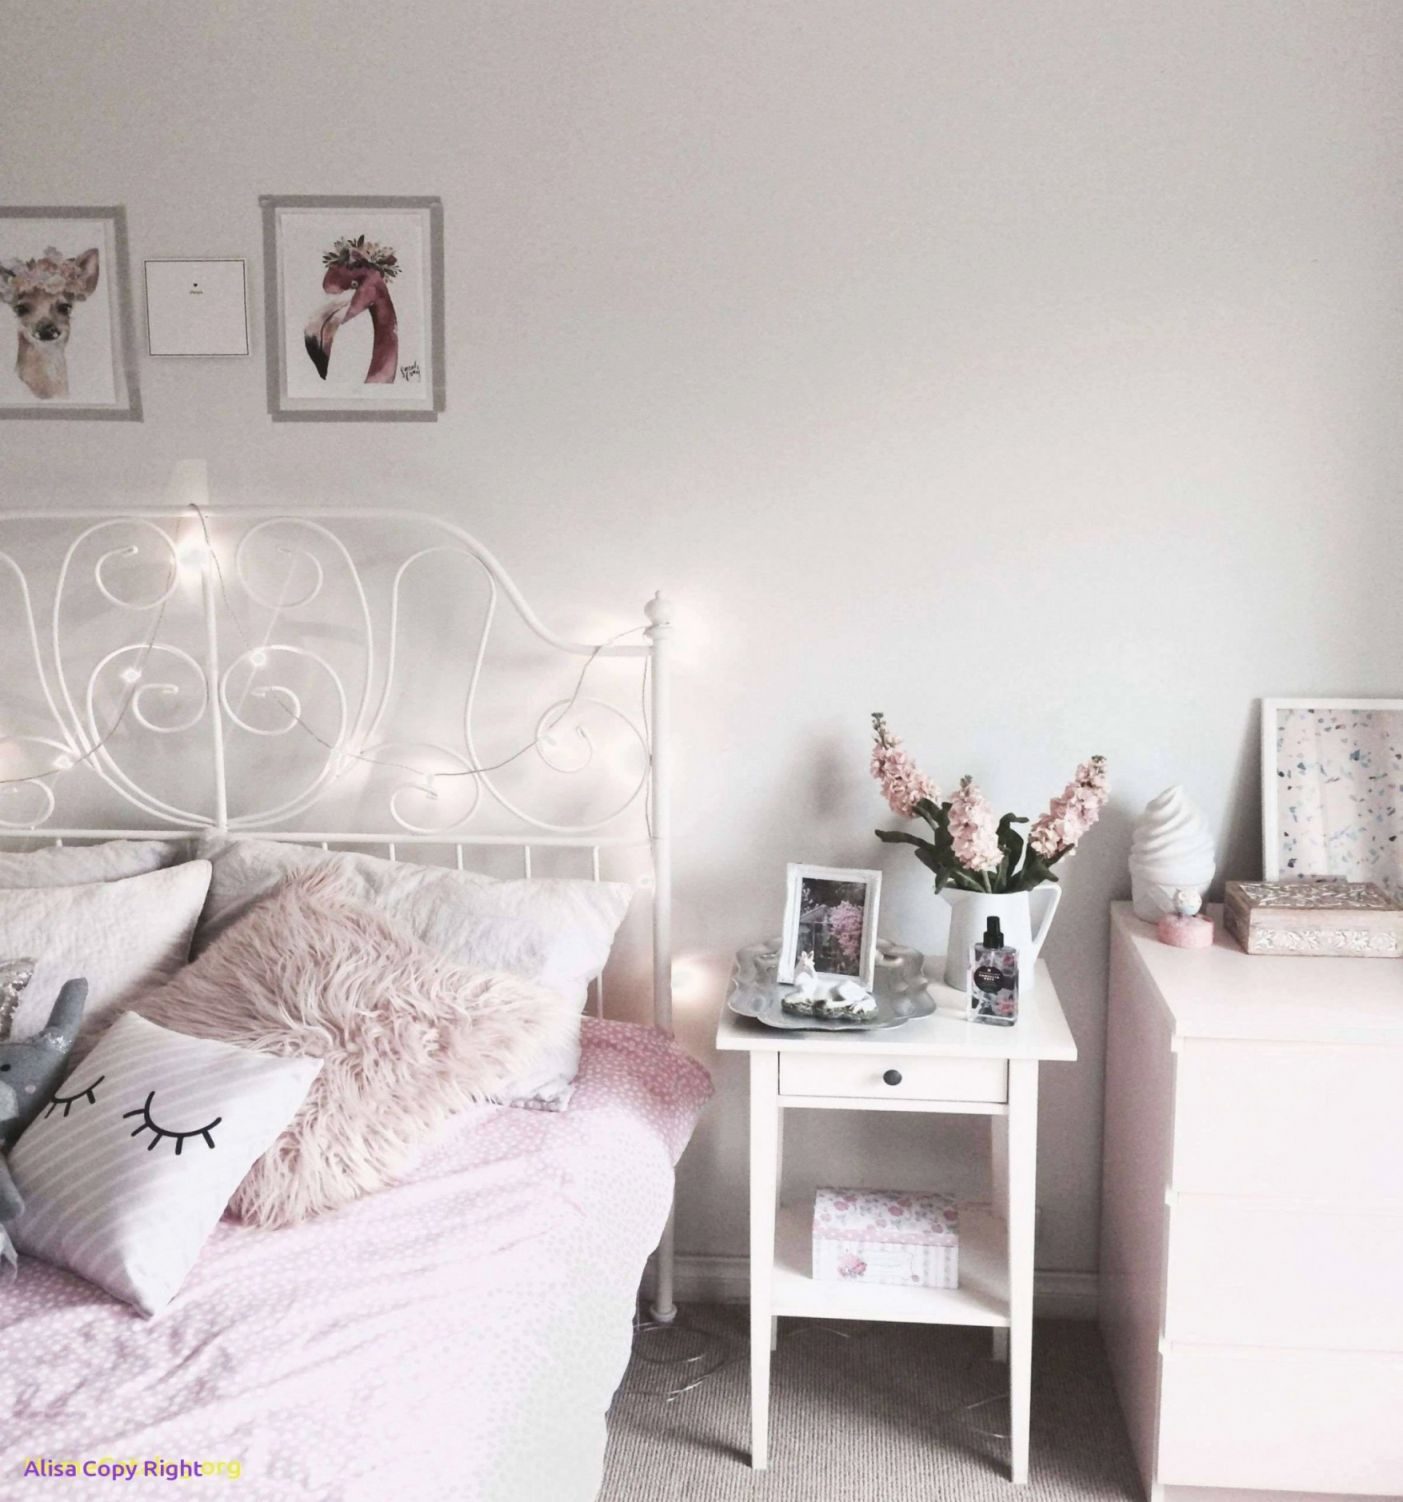 Wall Decor Ideas Diy Fresh Living Room Decor Ideas Diy with Unique Wall Decor Bedroom Ideas